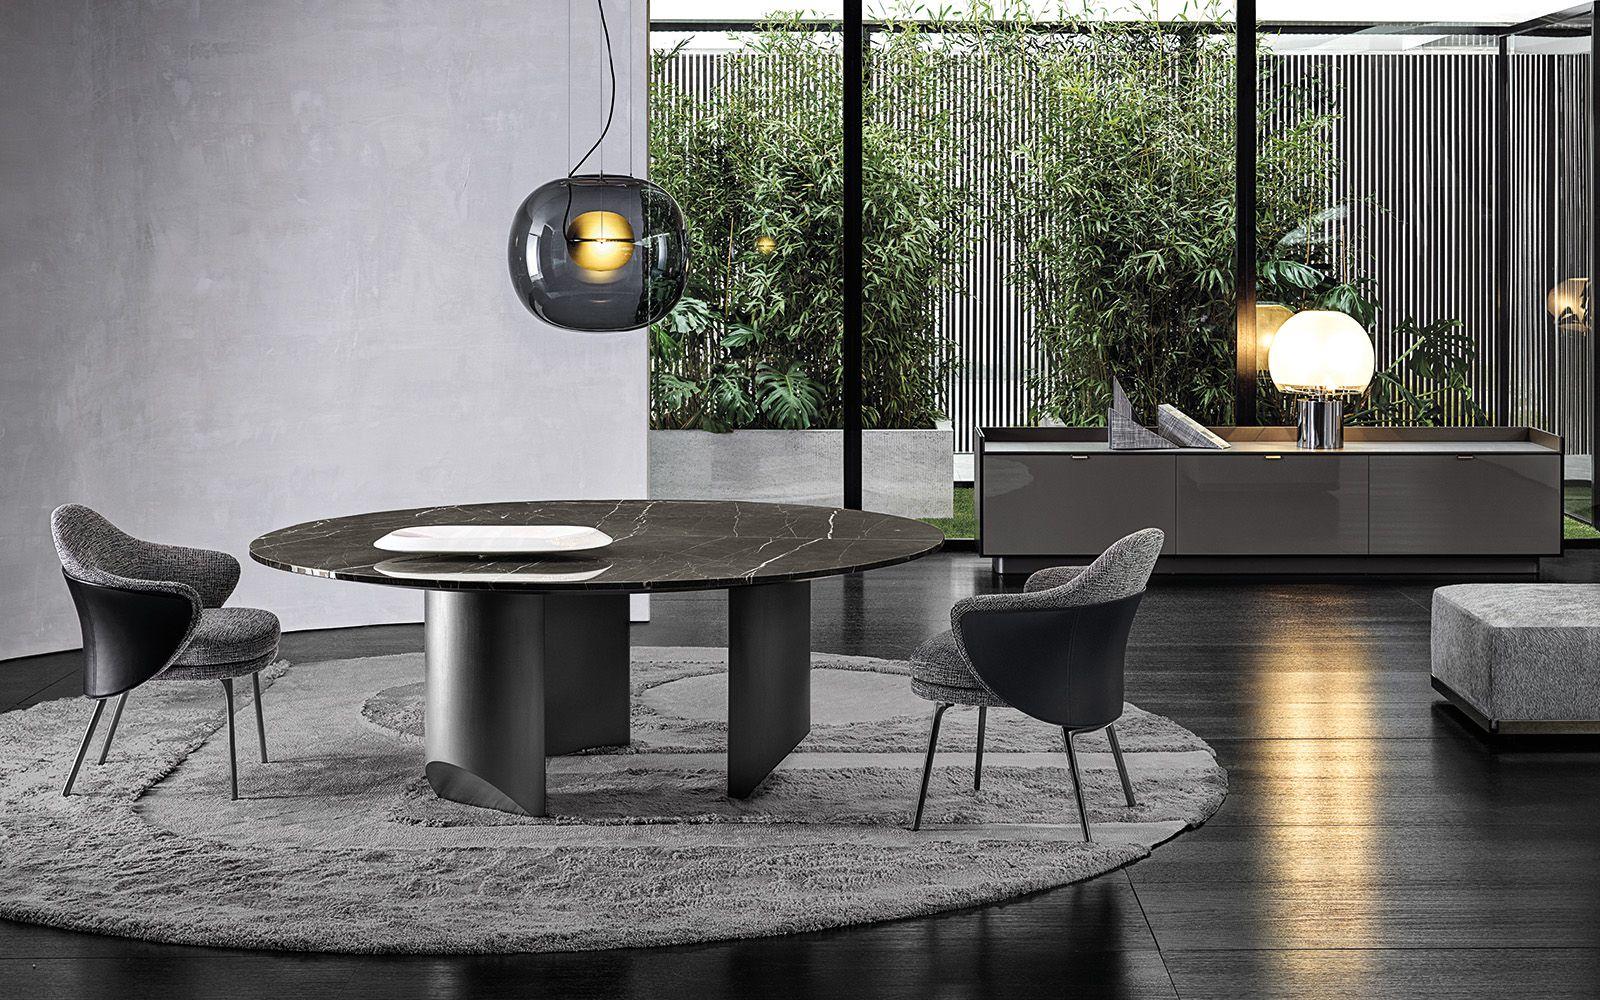 Wedge Dining Table Nendo Design Angie Dining Chair Gamfratesi Design Darren Sideboard Rodolfo Dordoni Design Minotti Dining Table Coffee Table Minotti